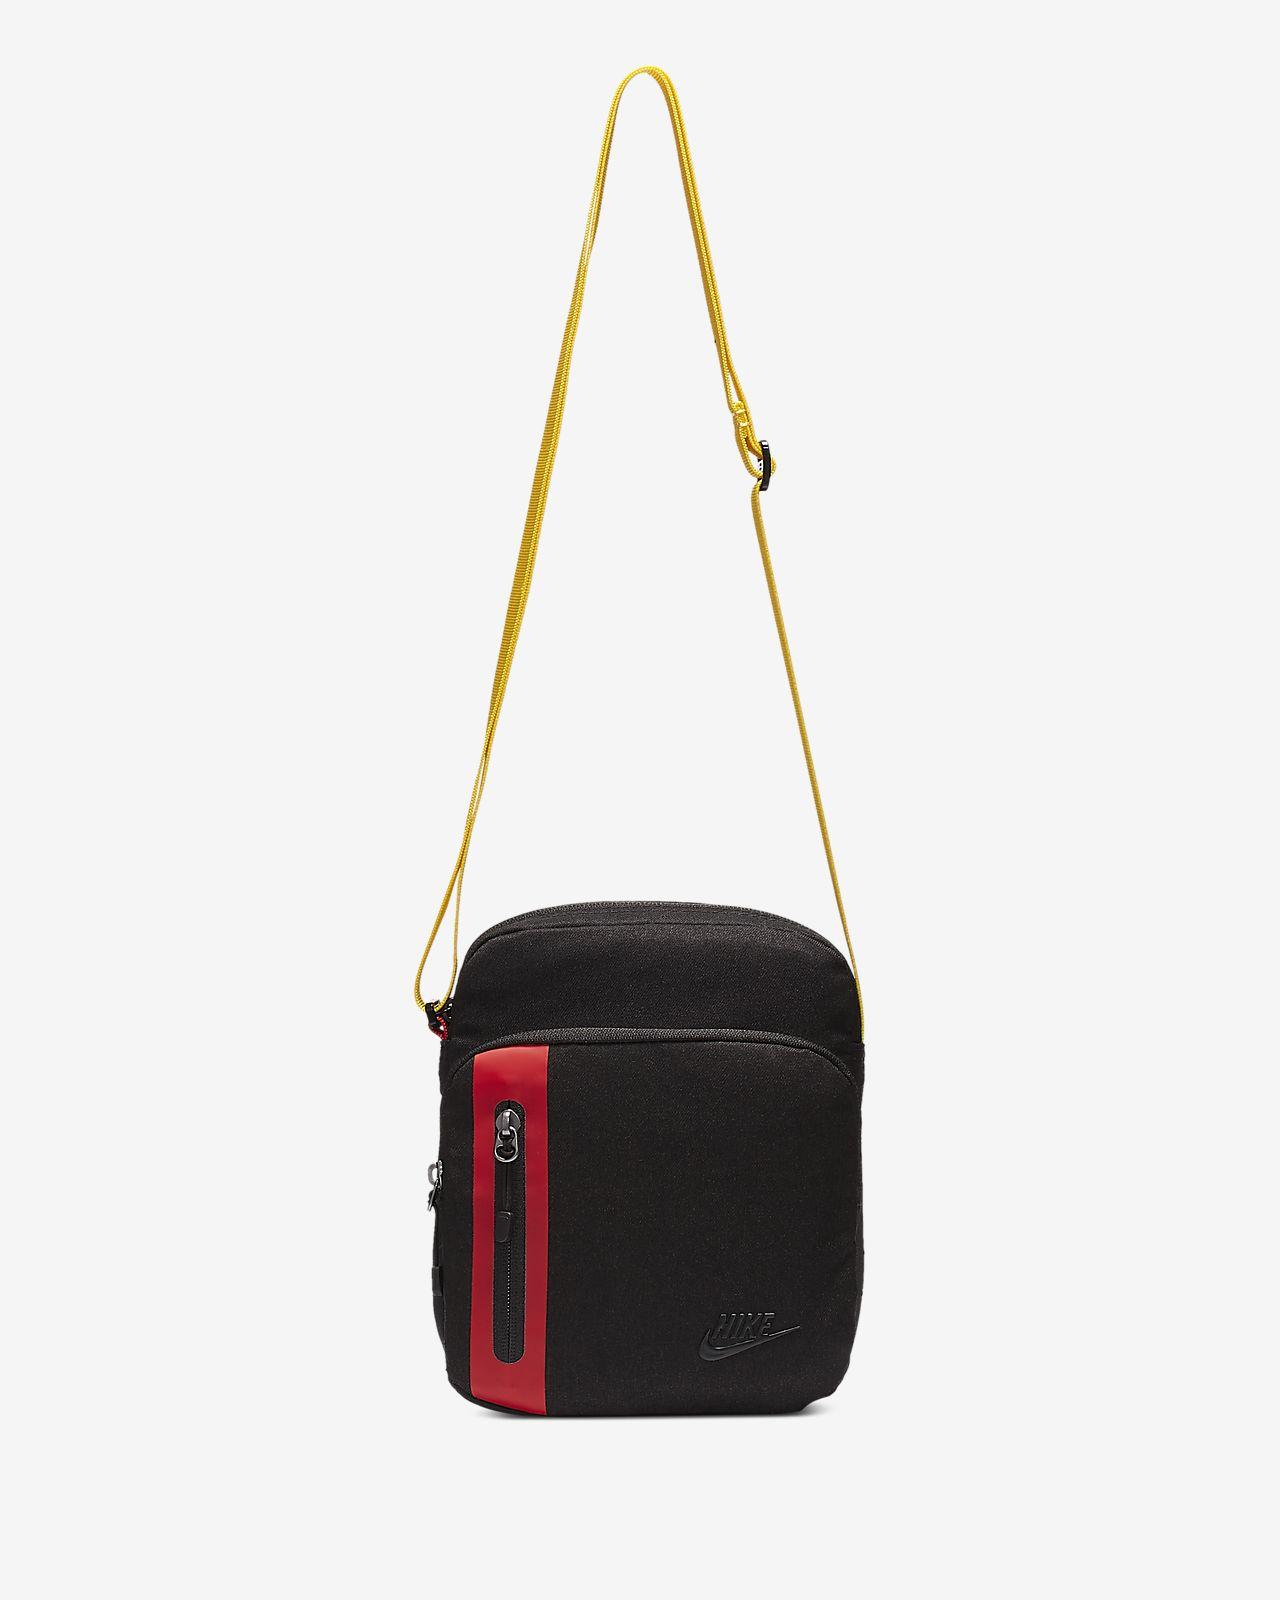 95d512eaf29f Nike Core Small Items 3.0 táska. Nike.com HU